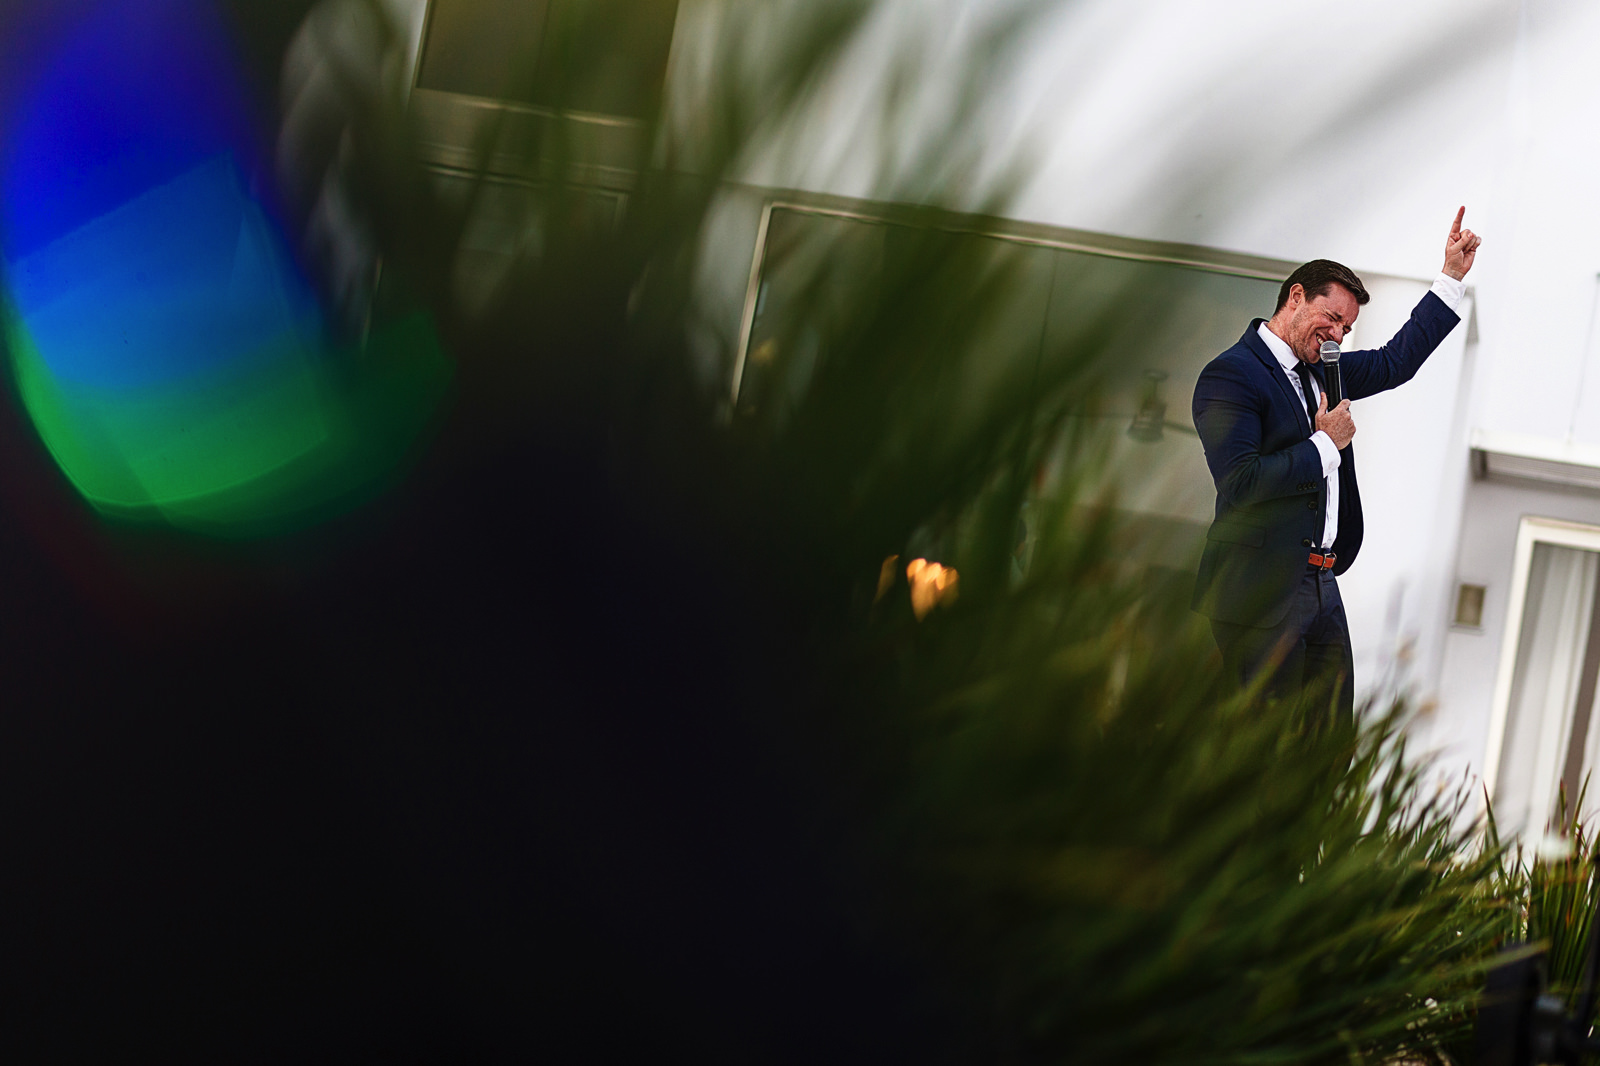 ceremony-master-giving-speech-wedding-couple